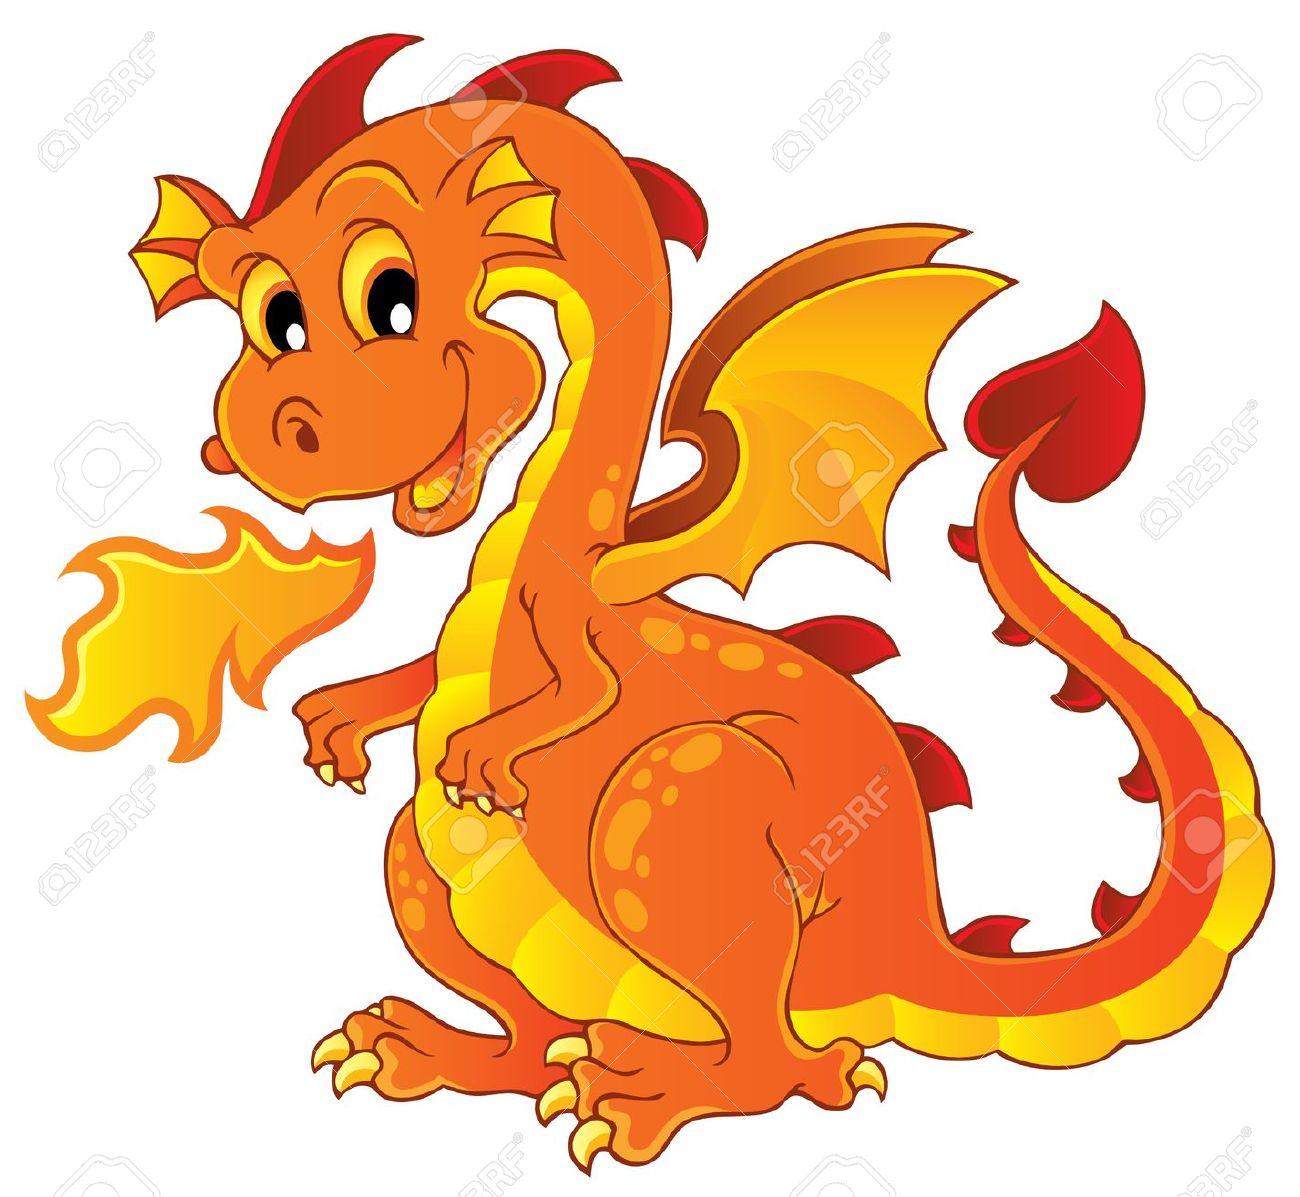 74 dragons clipart.